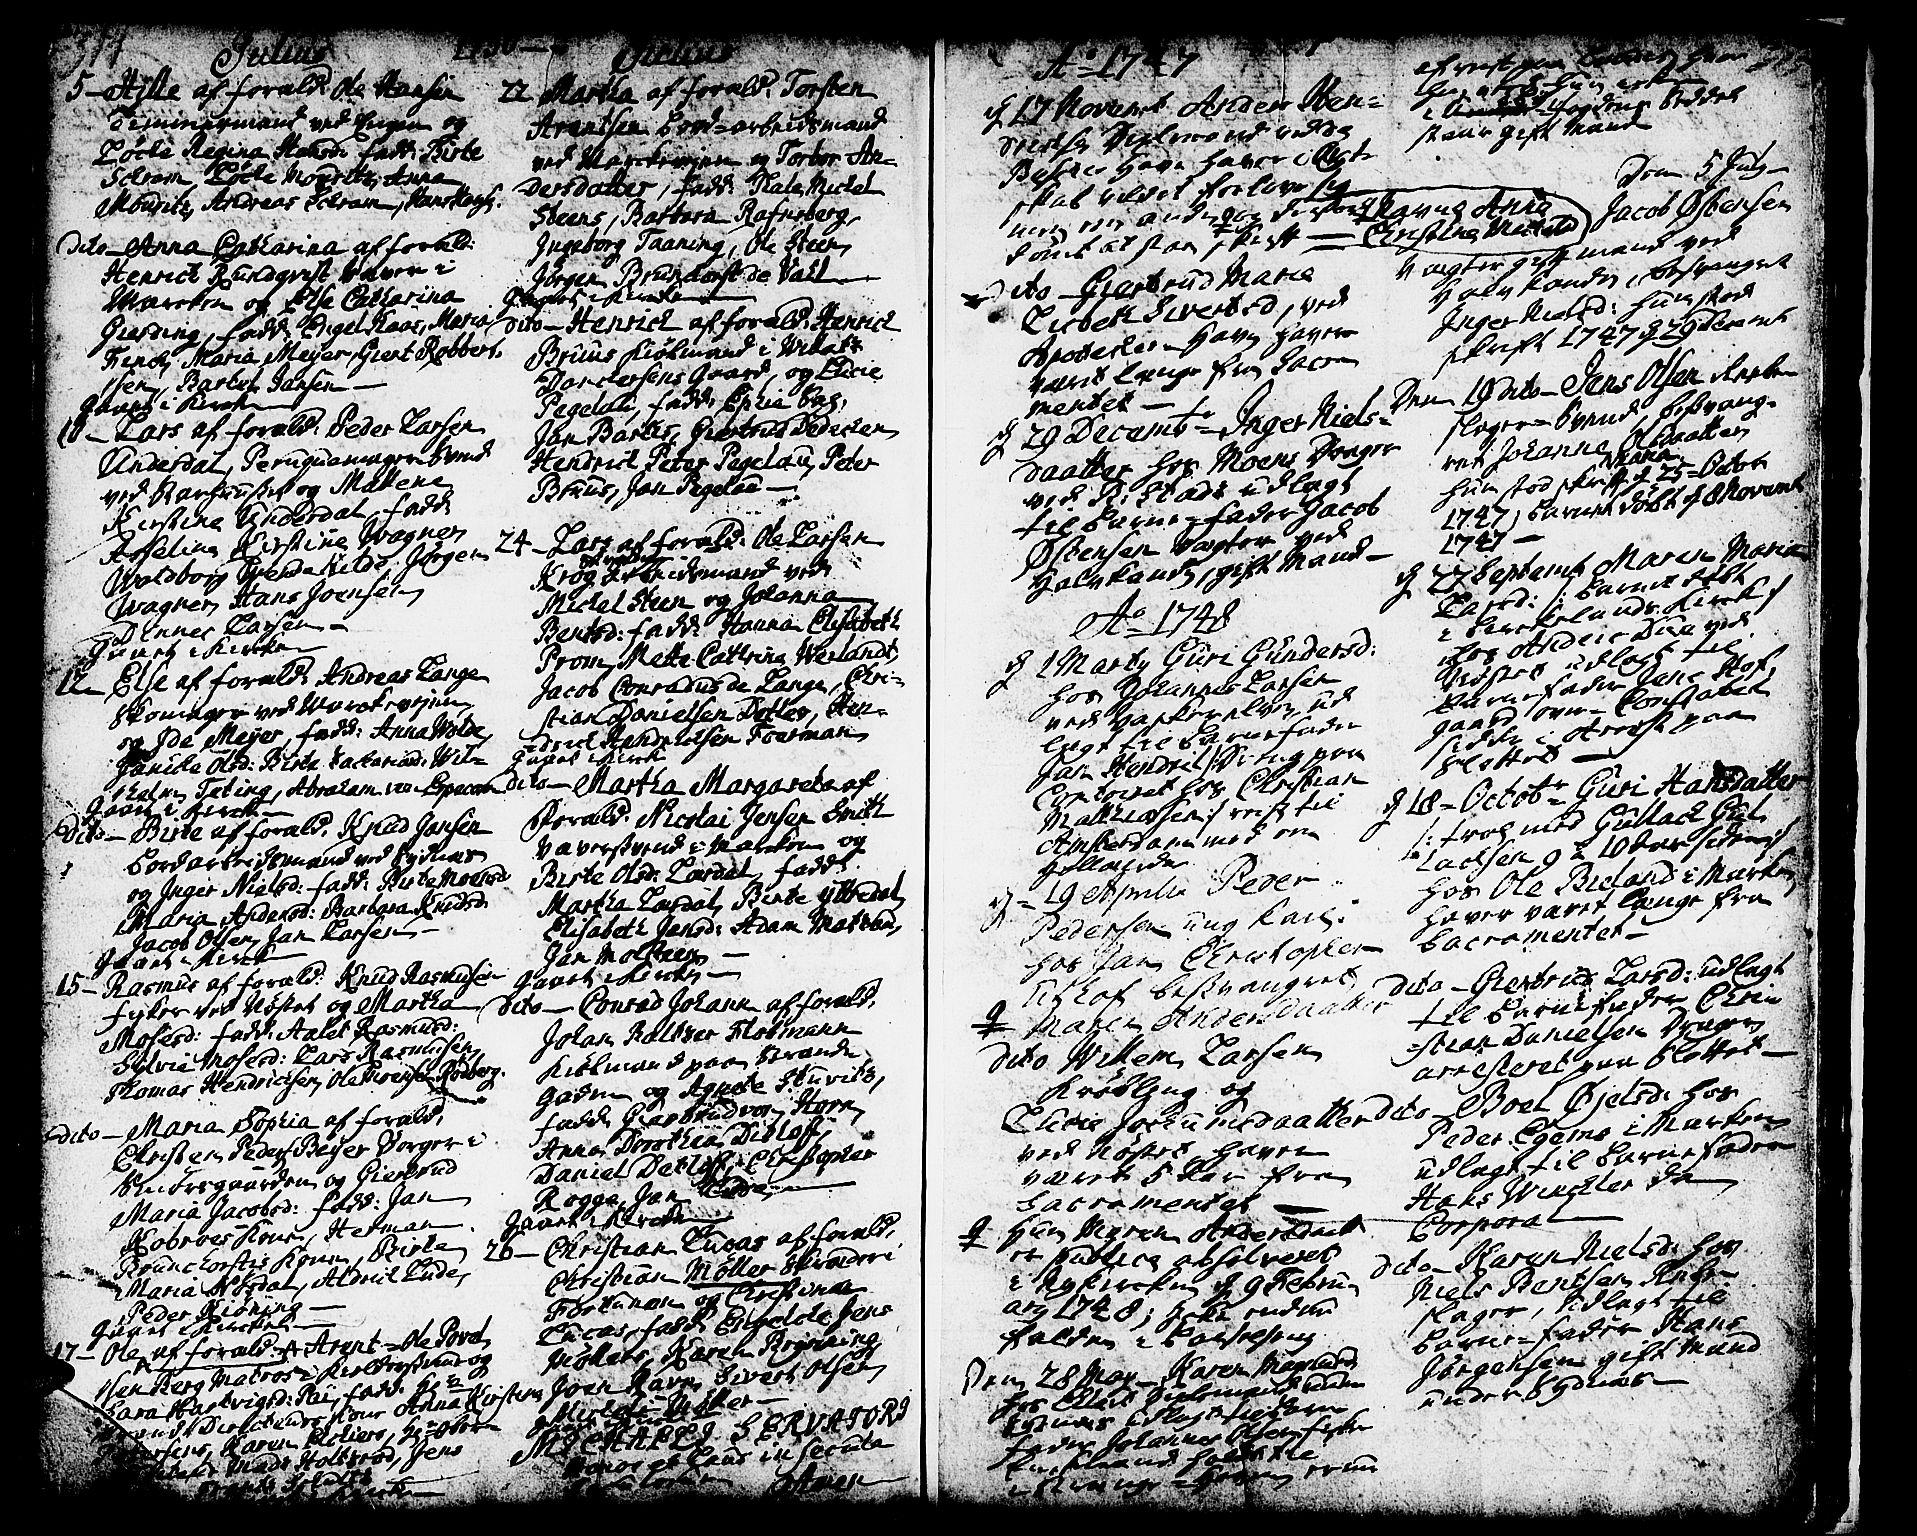 SAB, Domkirken Sokneprestembete, H/Haa/L0002: Ministerialbok nr. A 2, 1733-1750, s. 314-315